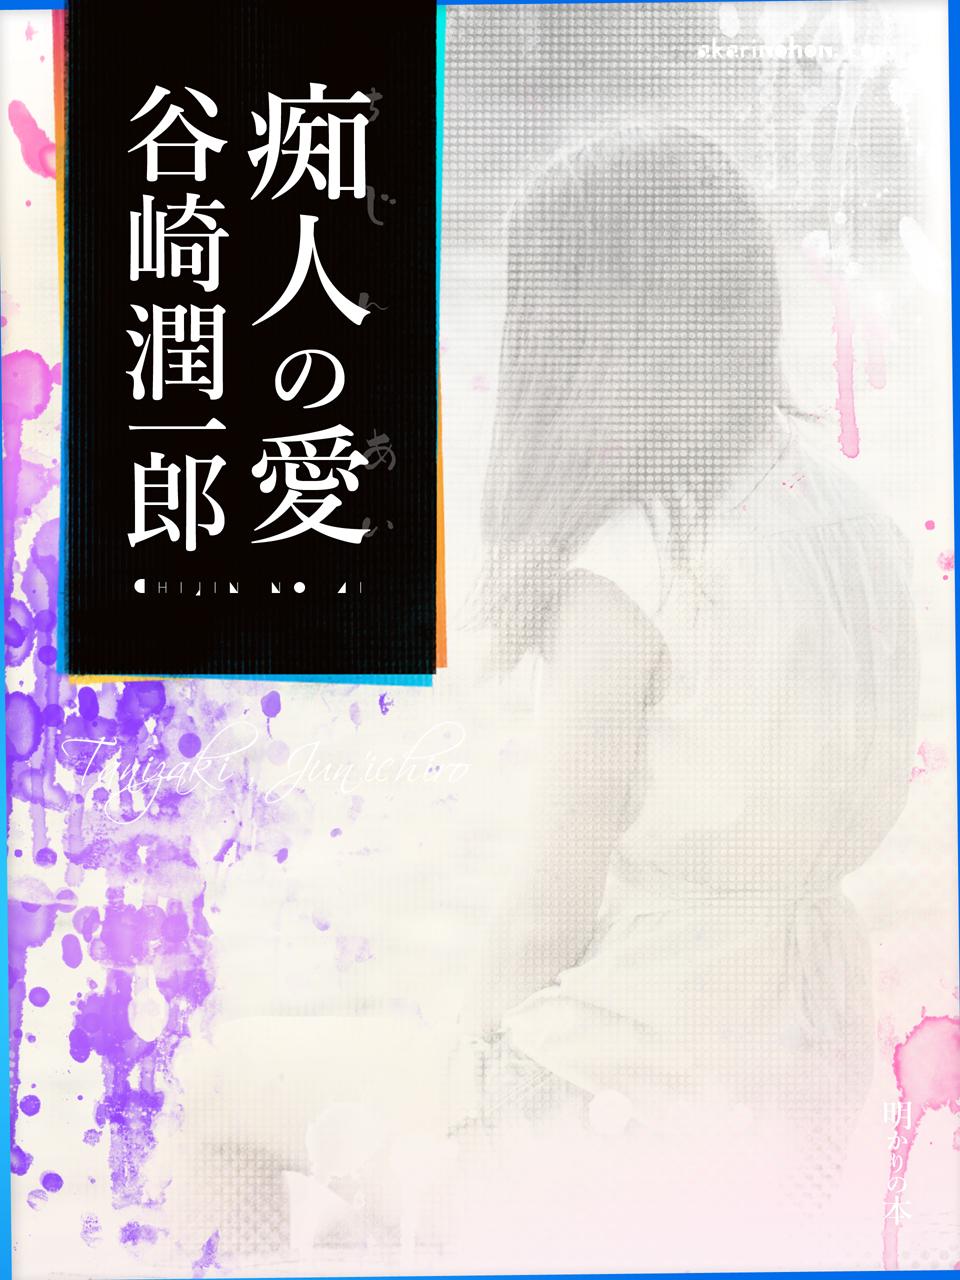 0000 - 痴人の愛 谷崎潤一郎